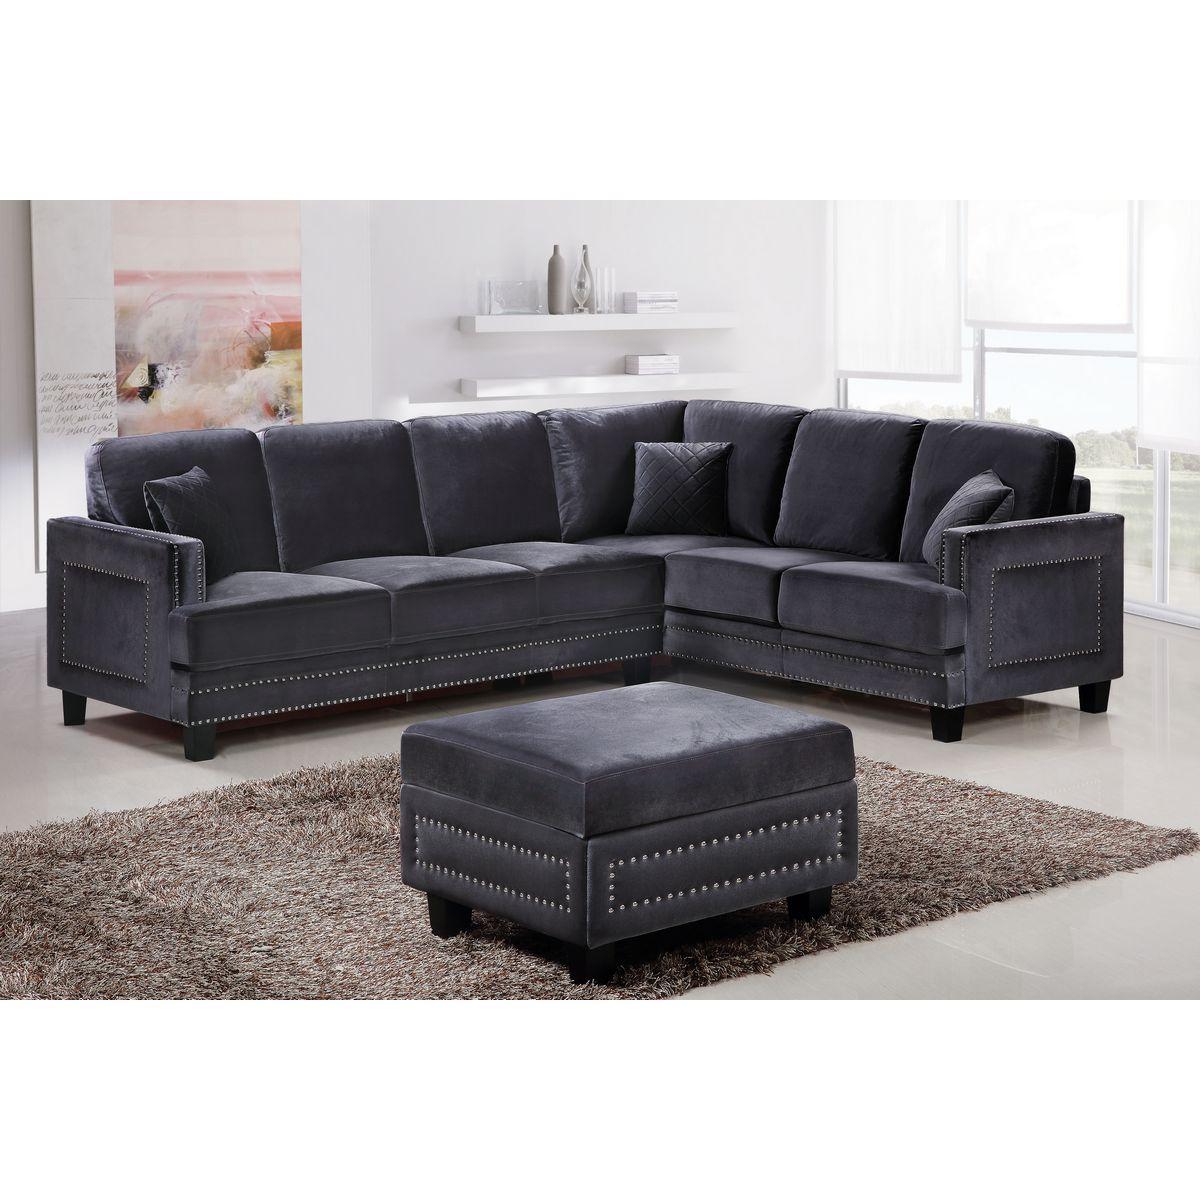 meridian 655gry sectional ferrara sectional sofa in gray velvet w nailhead trim